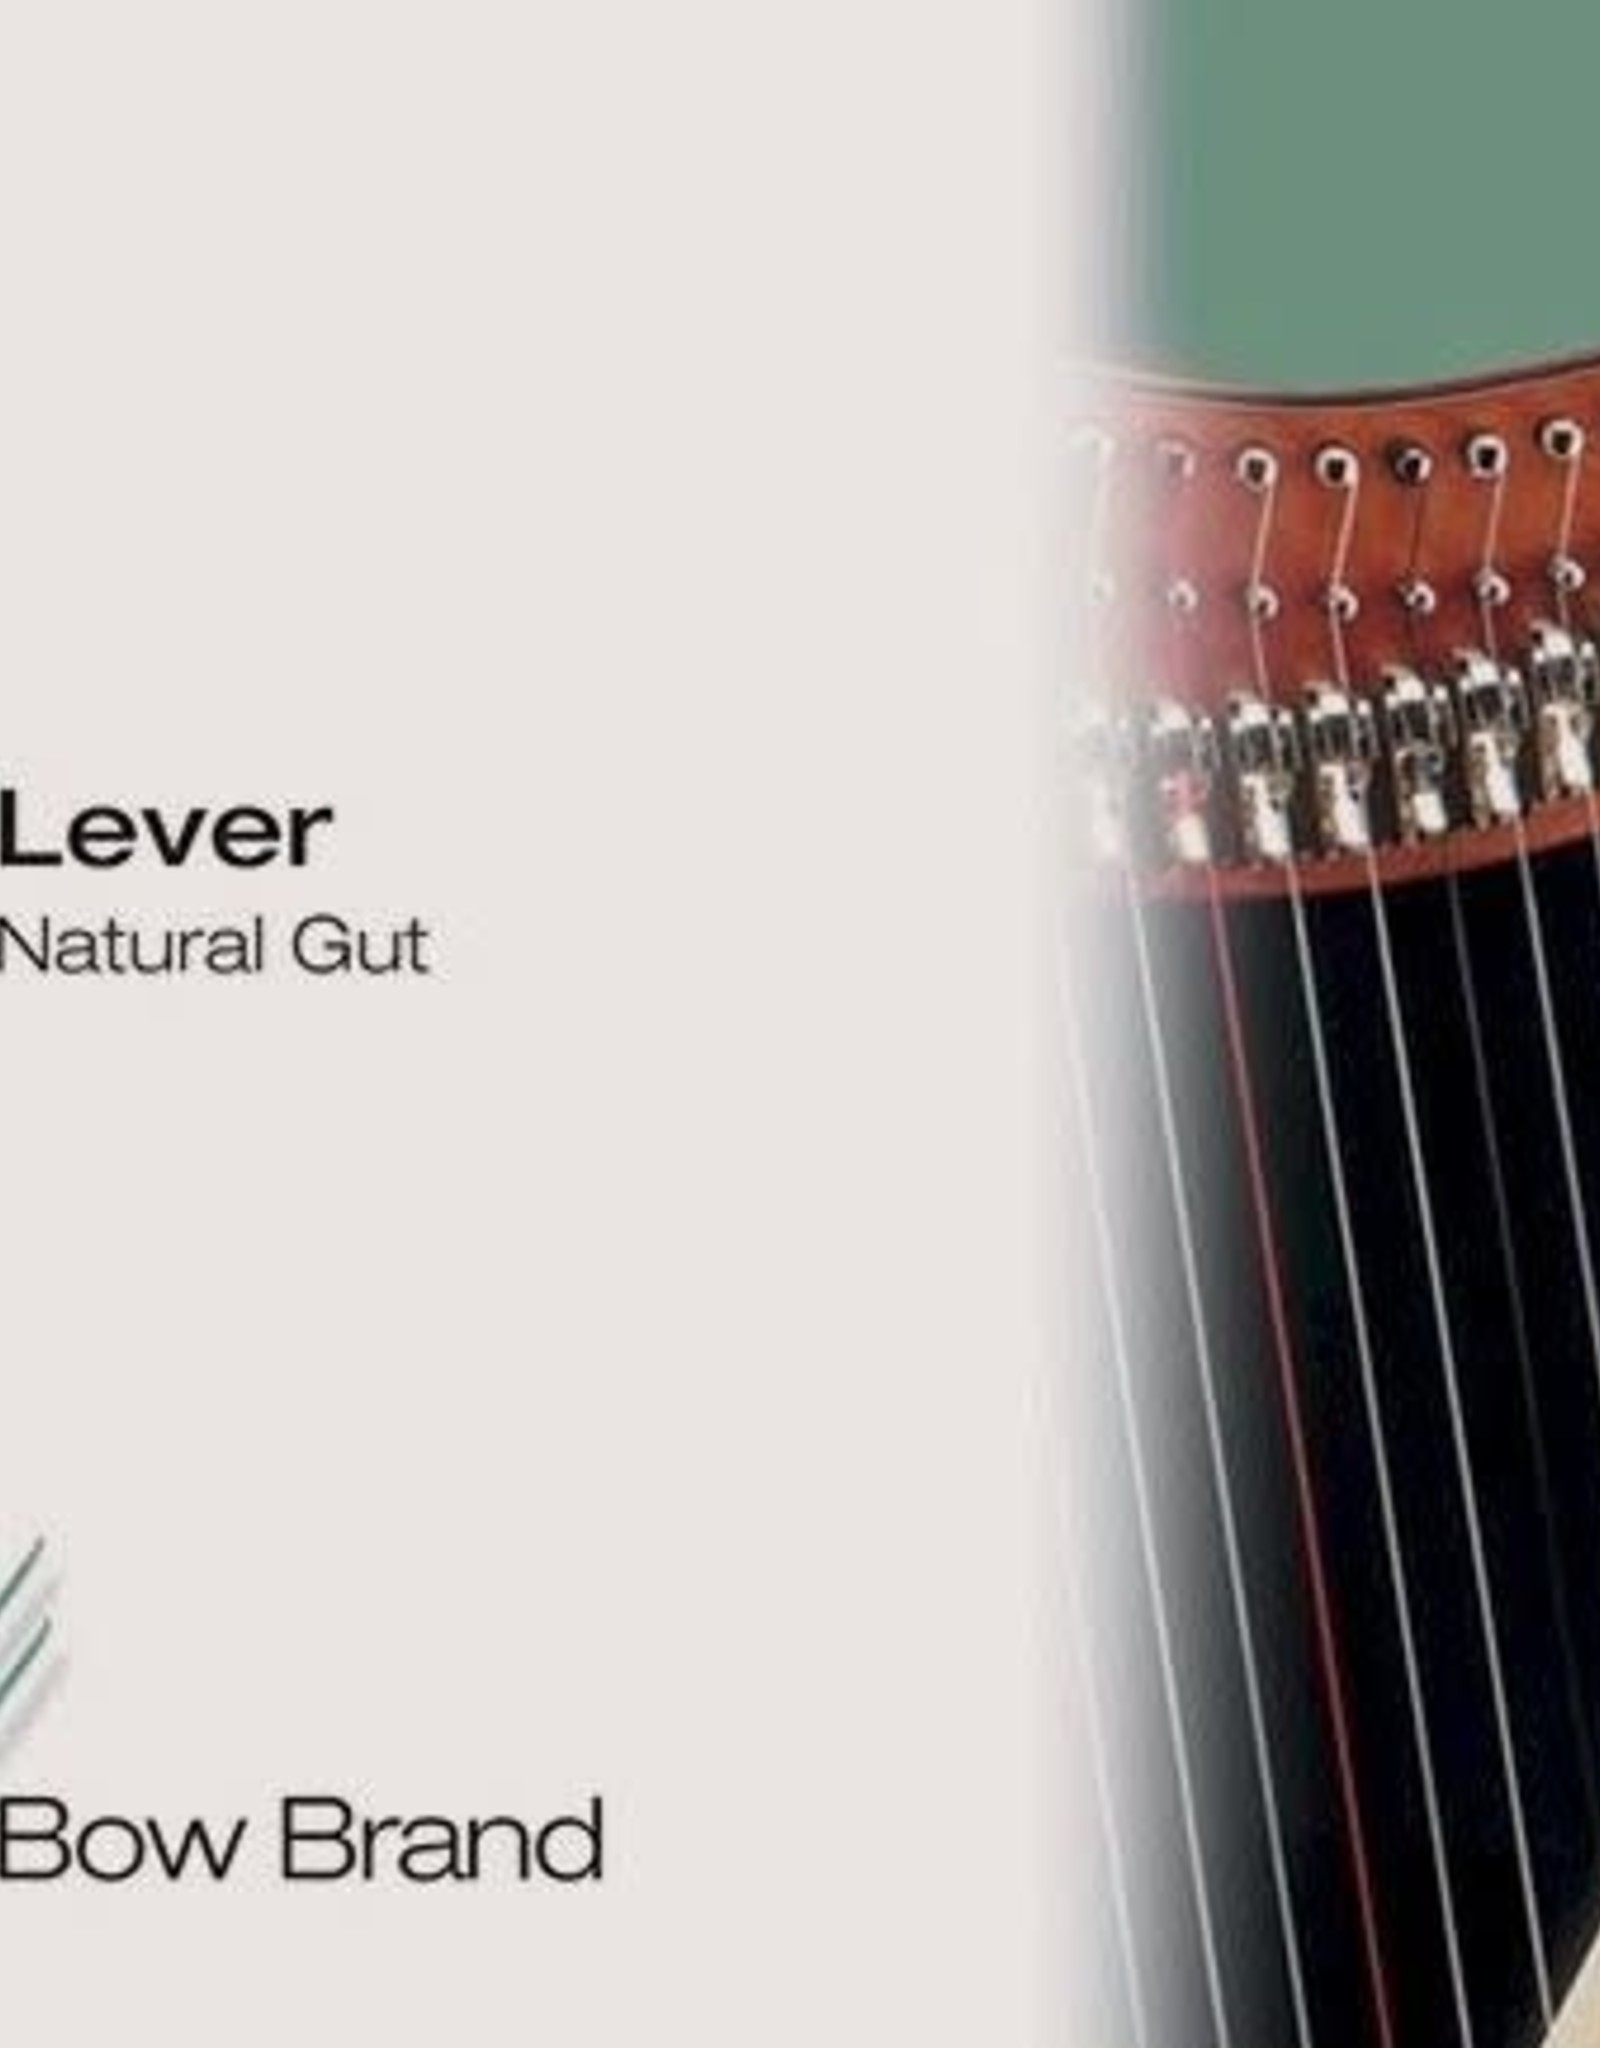 BOW BRAND  klep darm - lever GUT 5/1 la